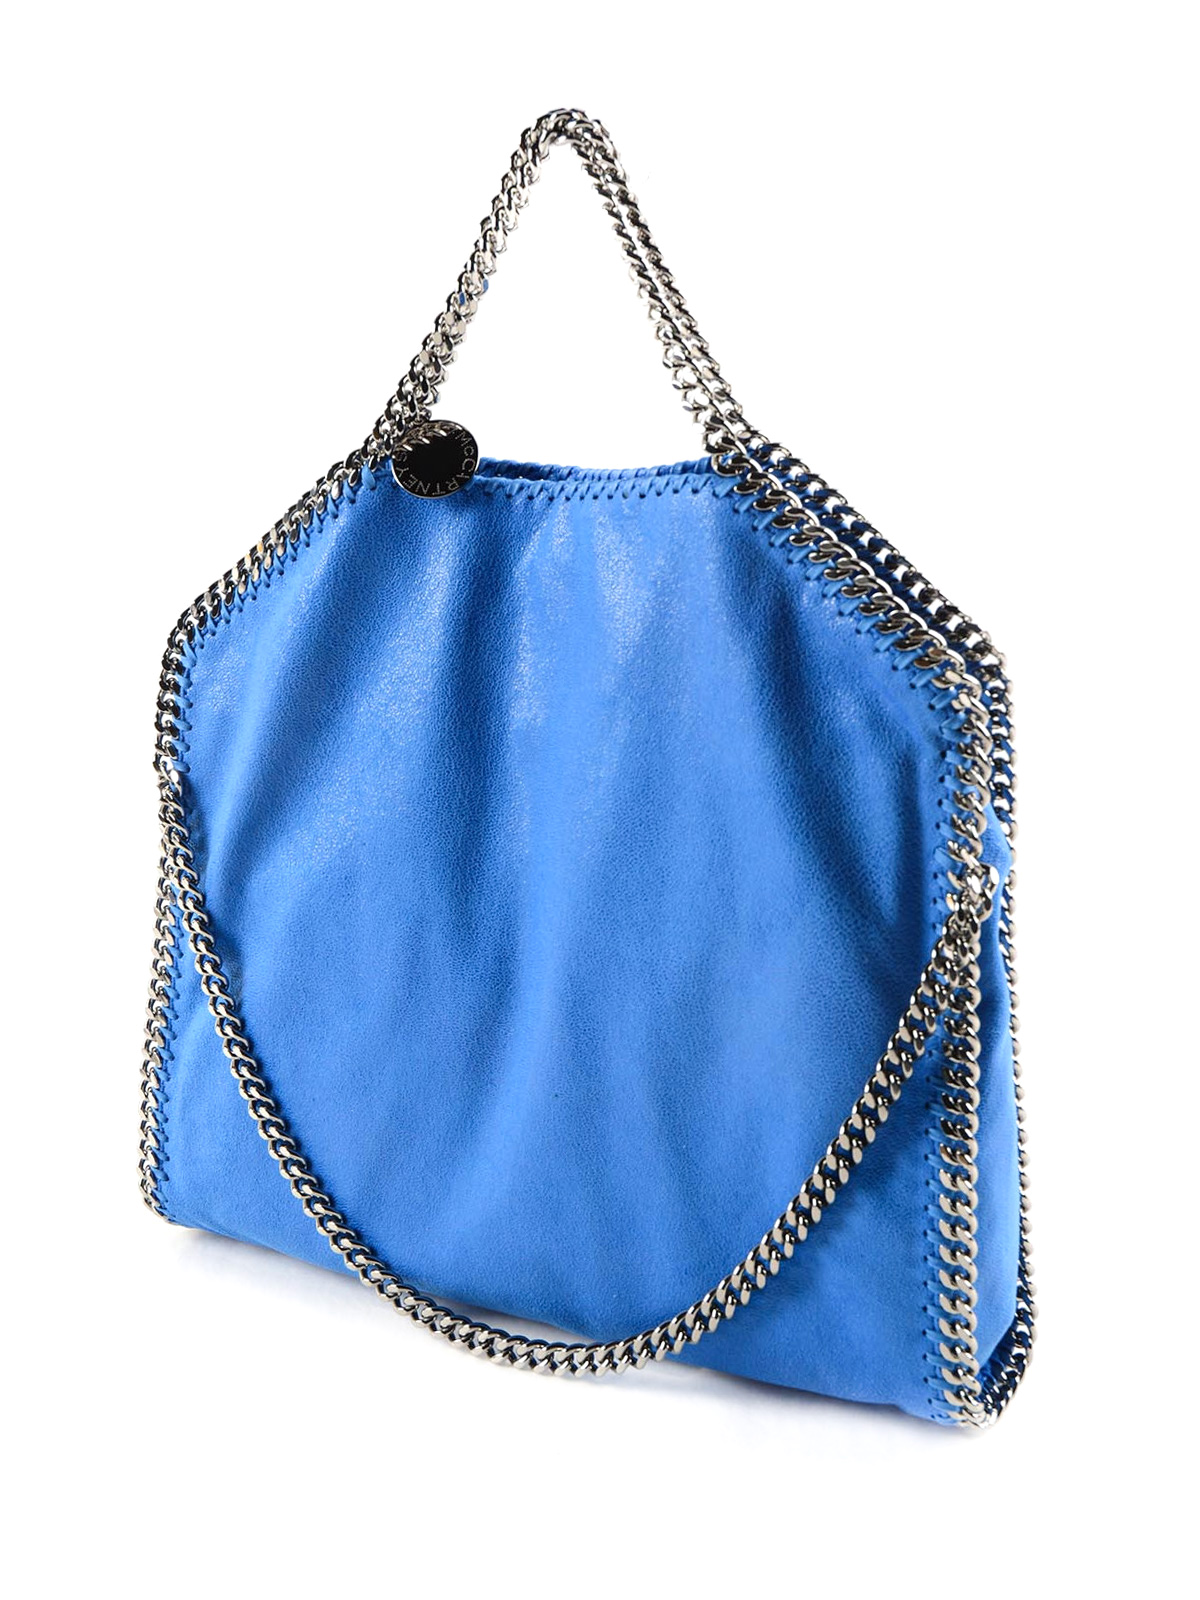 Stella Mccartney - Falabella three chain tote - totes bags - 234387 ... ad5515b261471